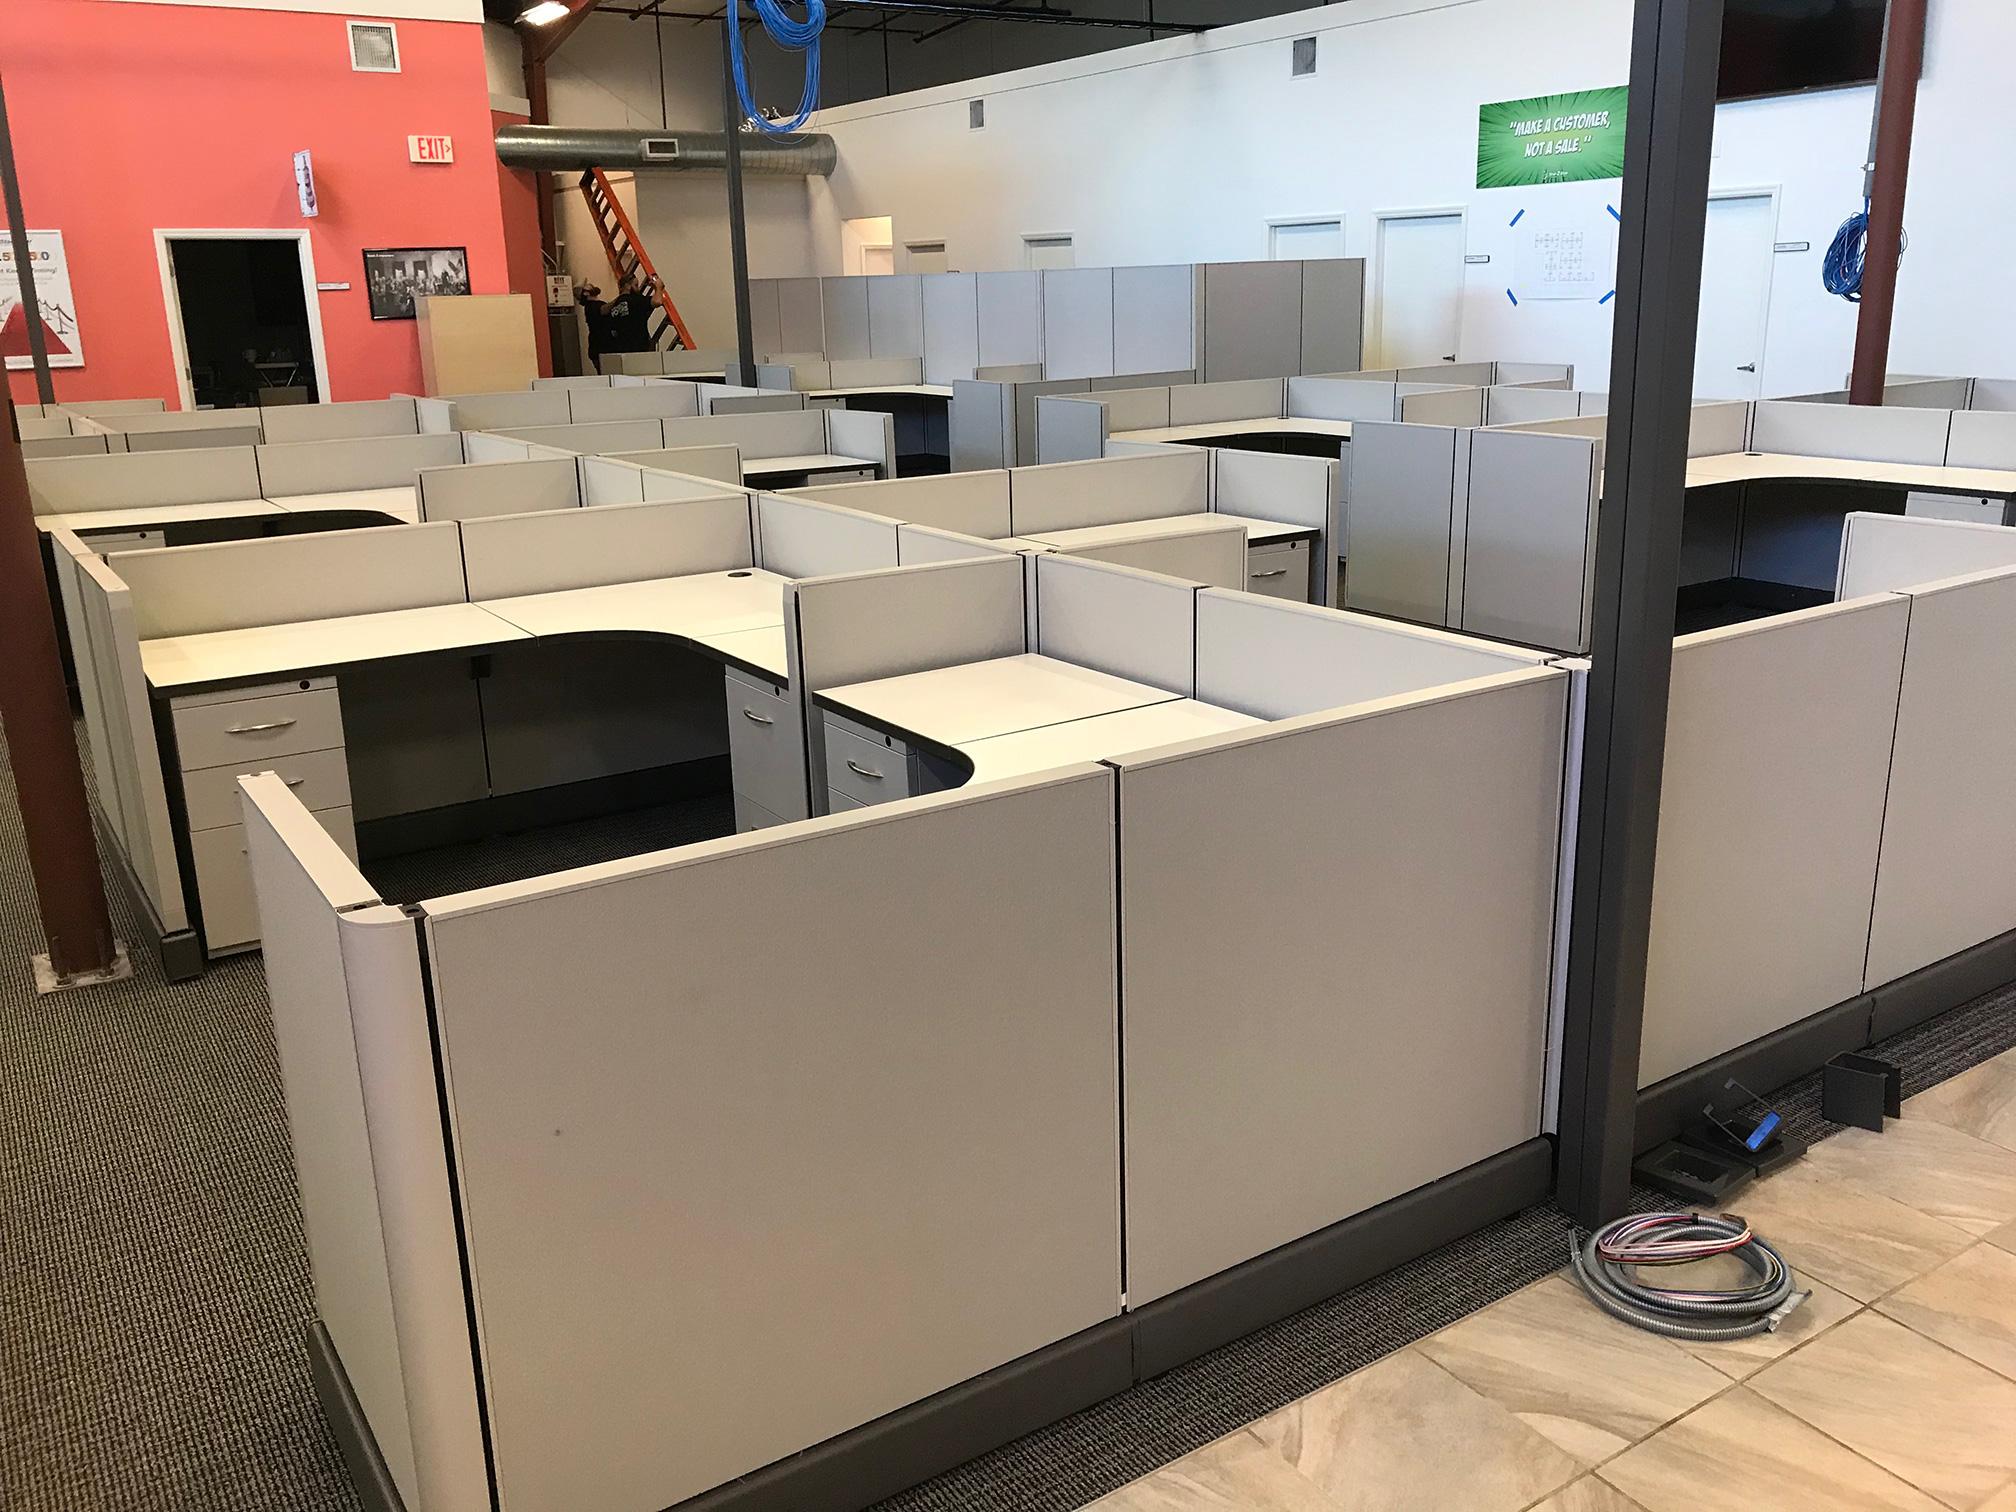 used-cubicles-for-sale-manasota-office-supplies-llc.jpg